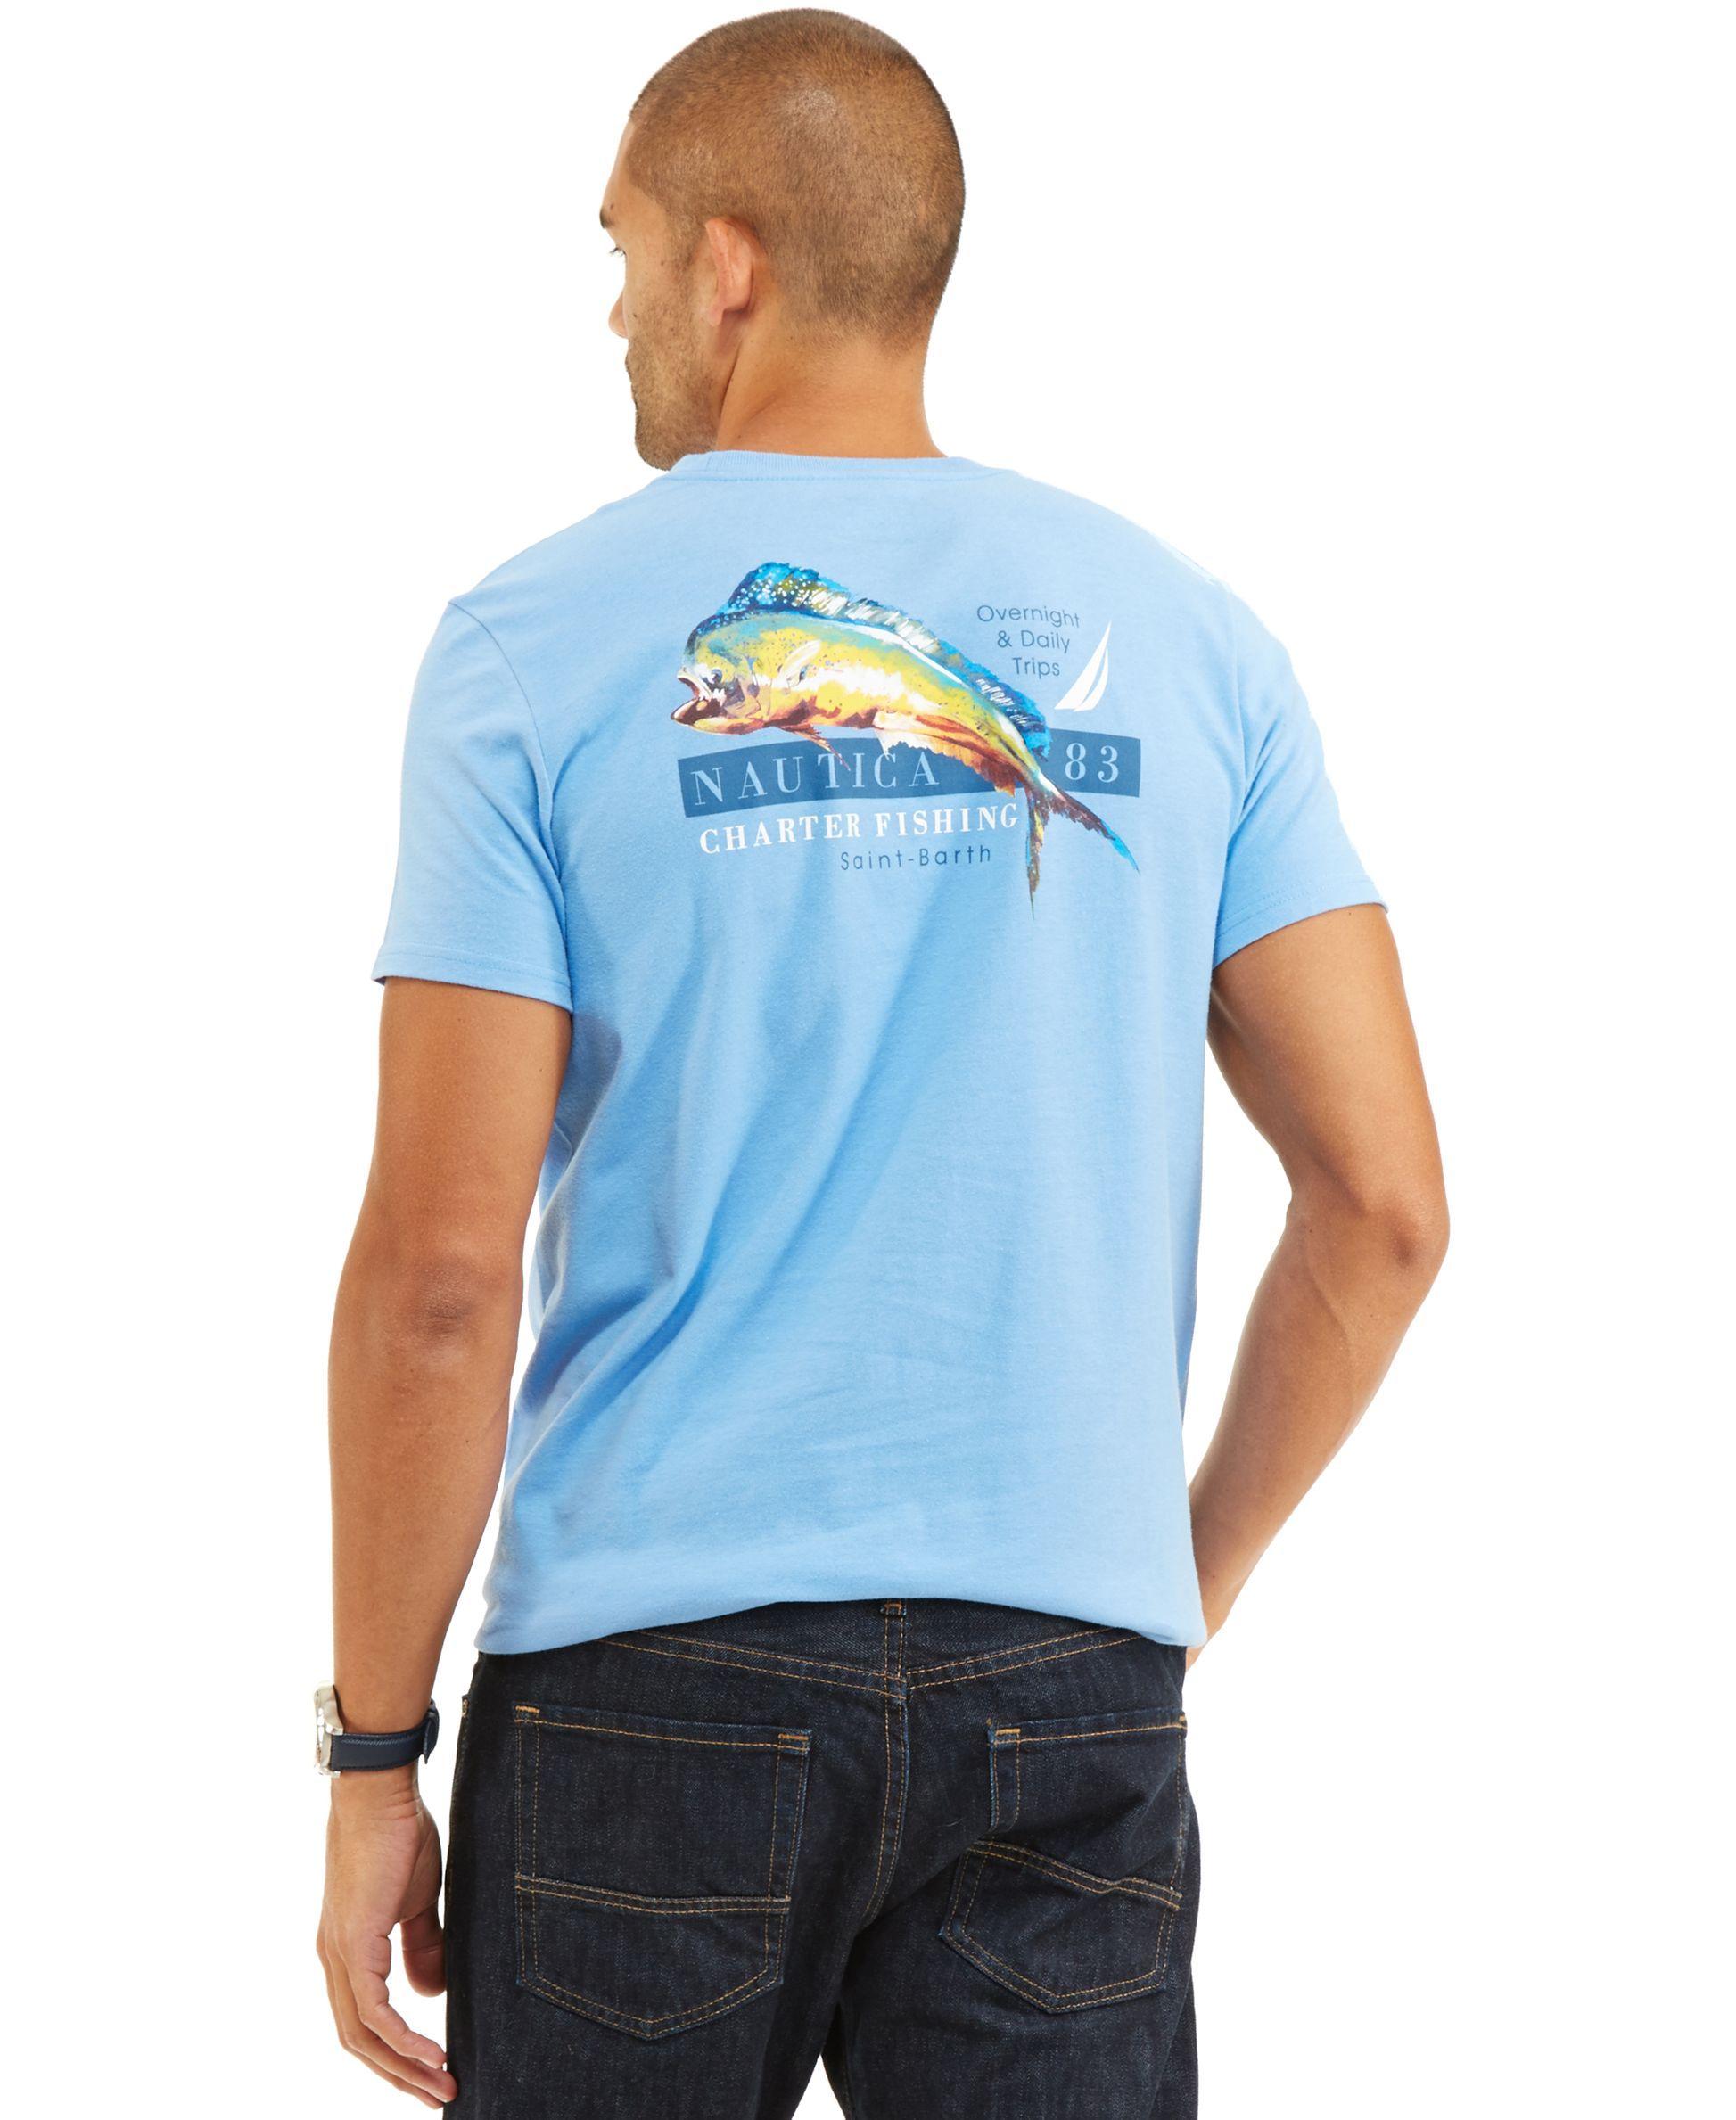 d0ca83cb Nautica Big and Tall Charter Fish Graphic-Print Logo T-Shirt ...